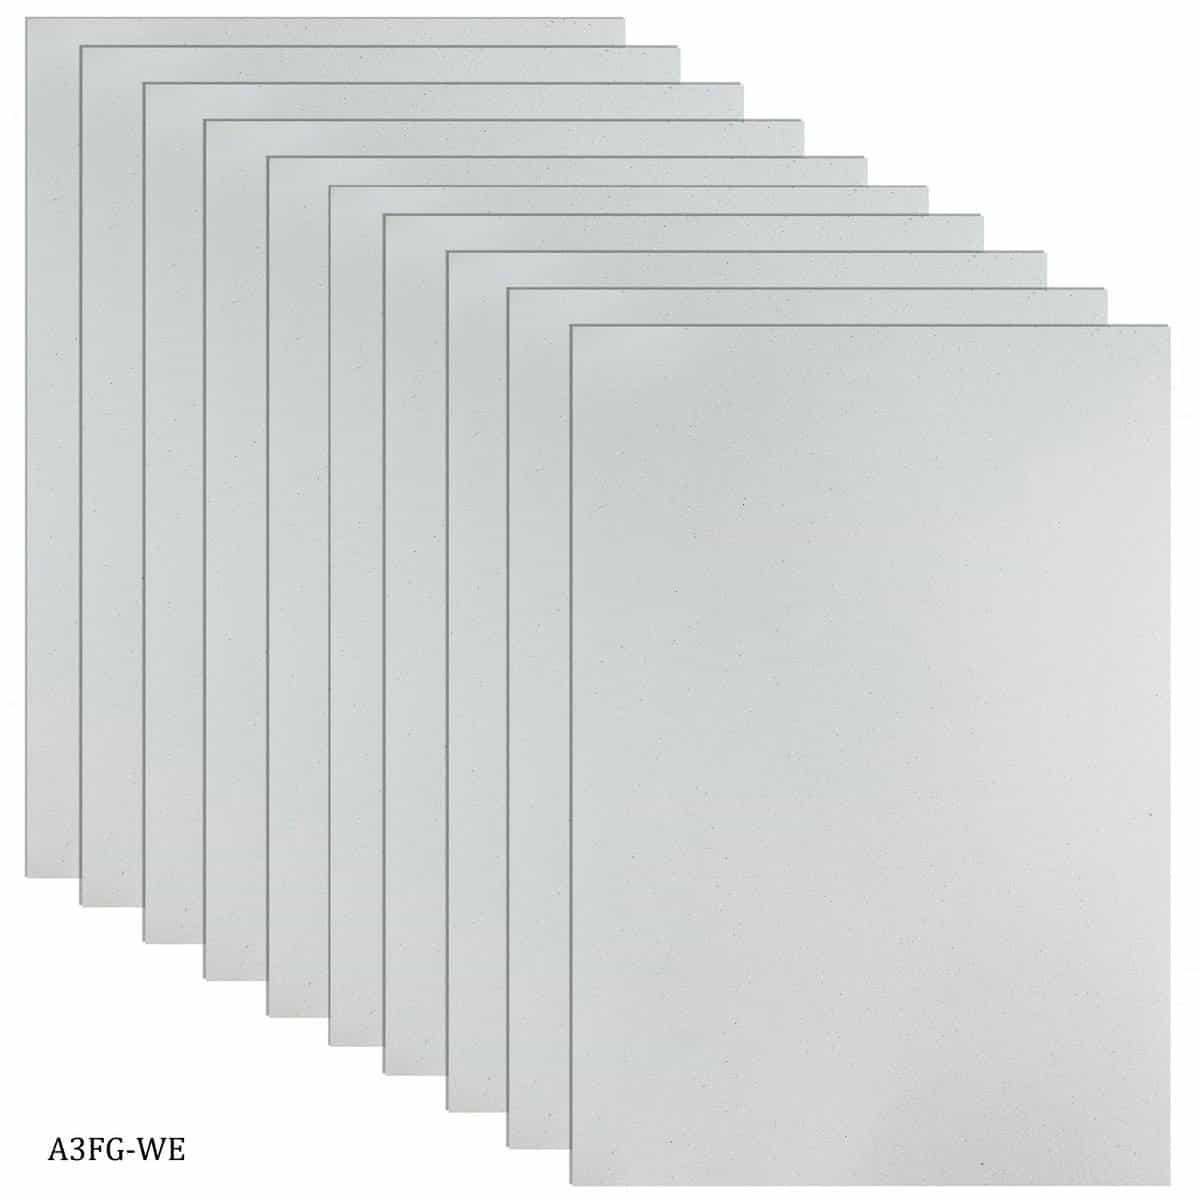 Glitter Foam A3 Sheet Without Sticker White